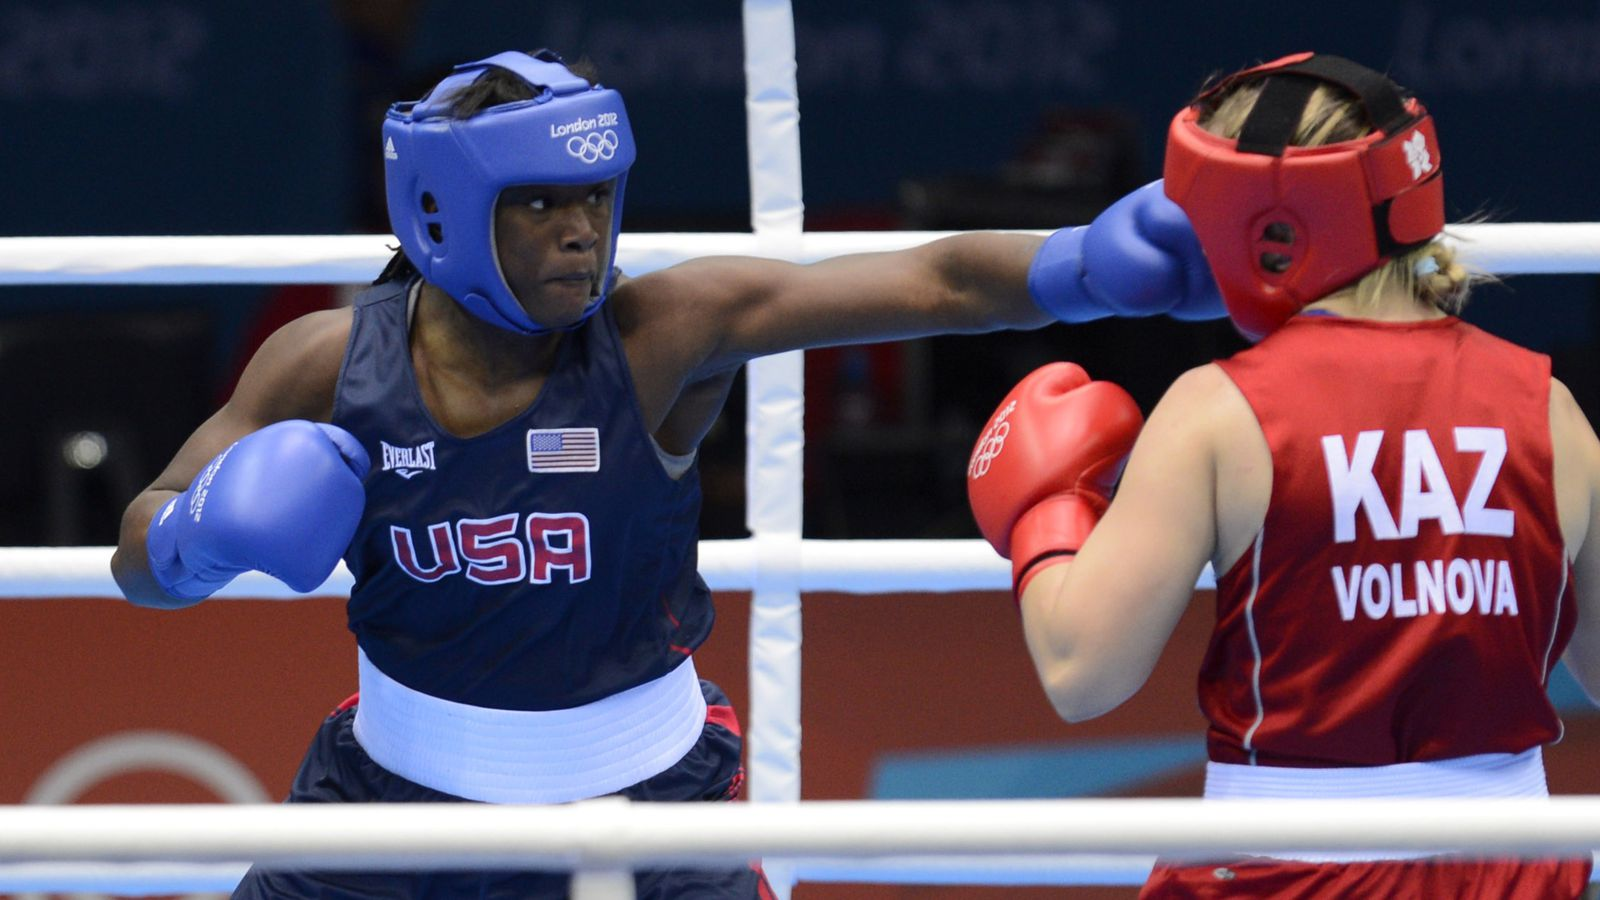 Kopfbedeckung usa boxing amateur wettbewerb